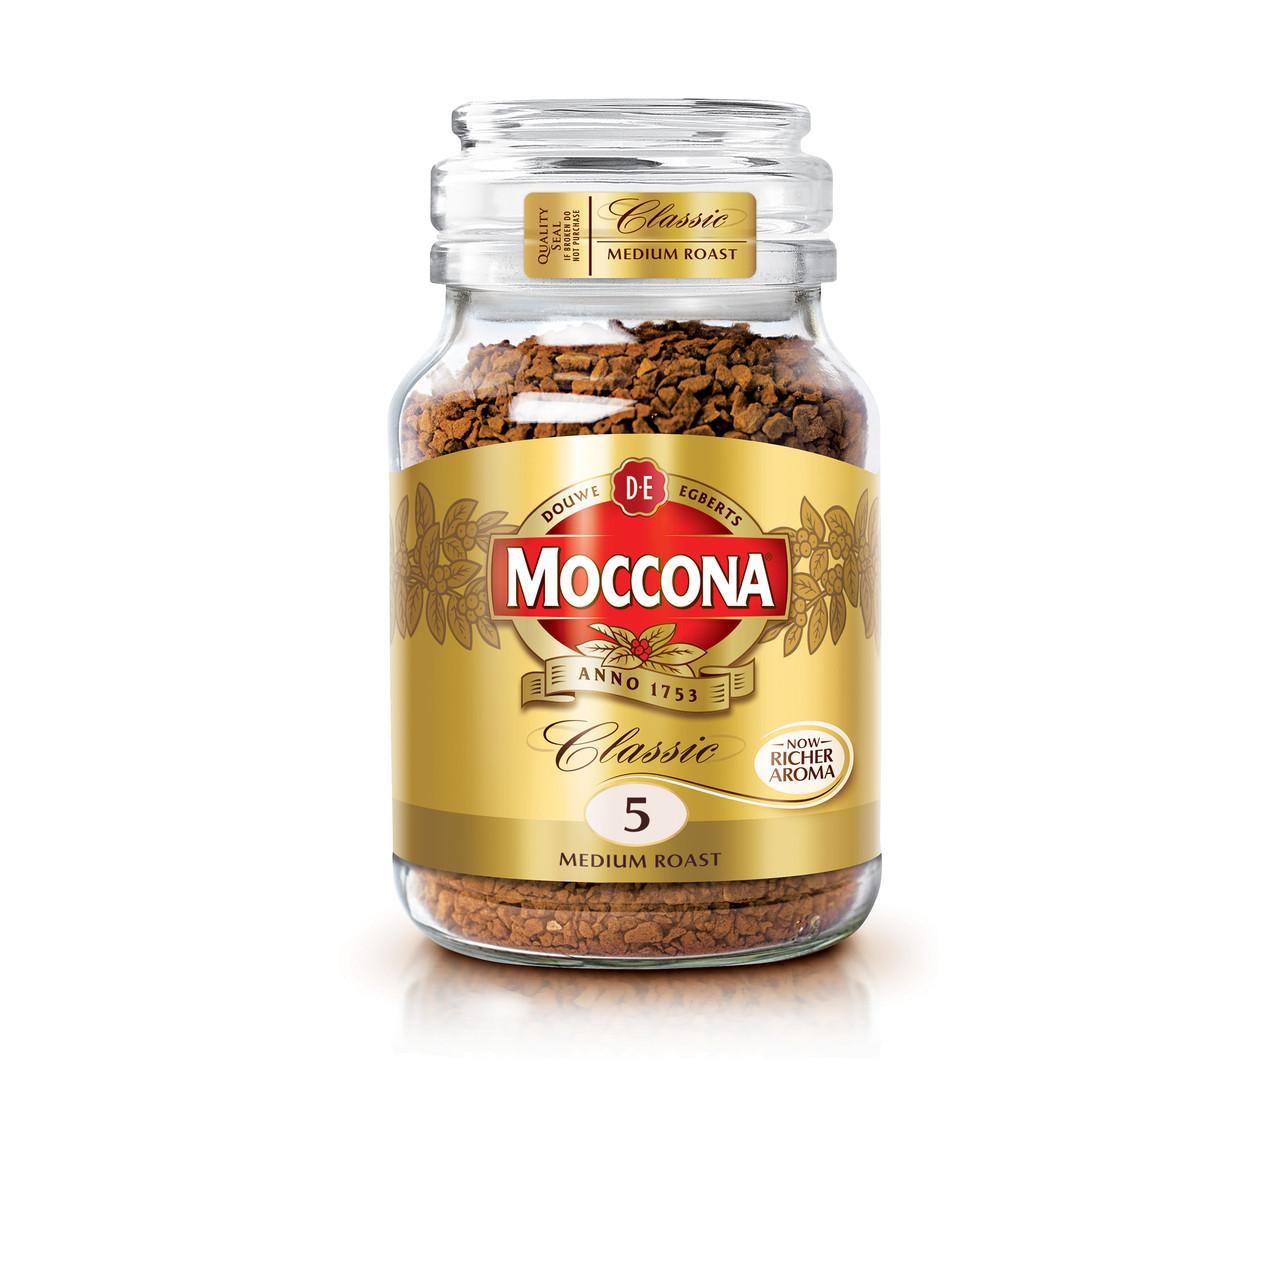 Moccona 4019302 Coffee Classic Medium Roast Jar 400g Megax